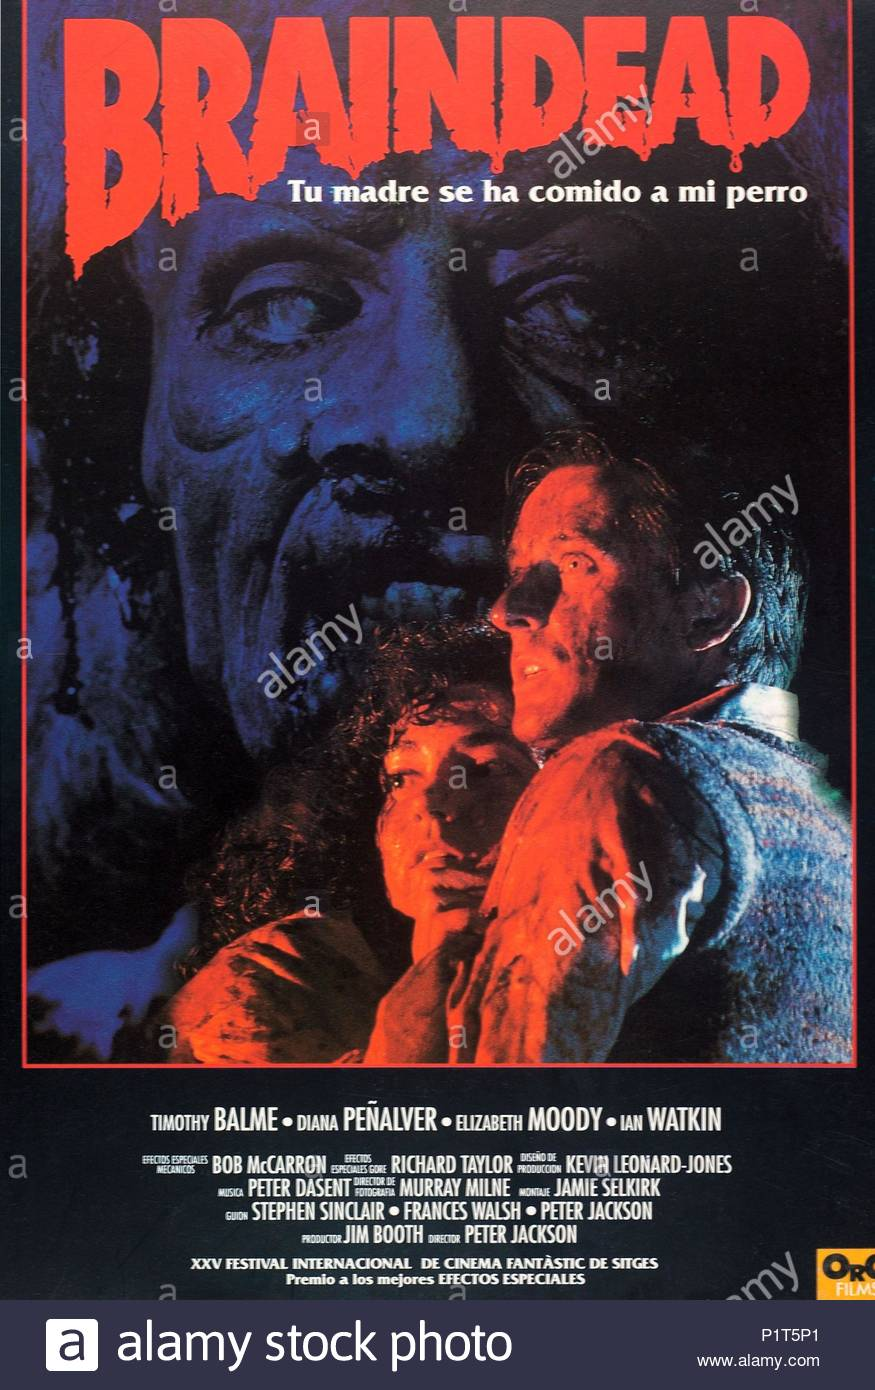 593778b3c62f English Title  BRAINDEAD. Film Director  PETER JACKSON. Year  1992. Credit   WINGNUT FILMS   Album